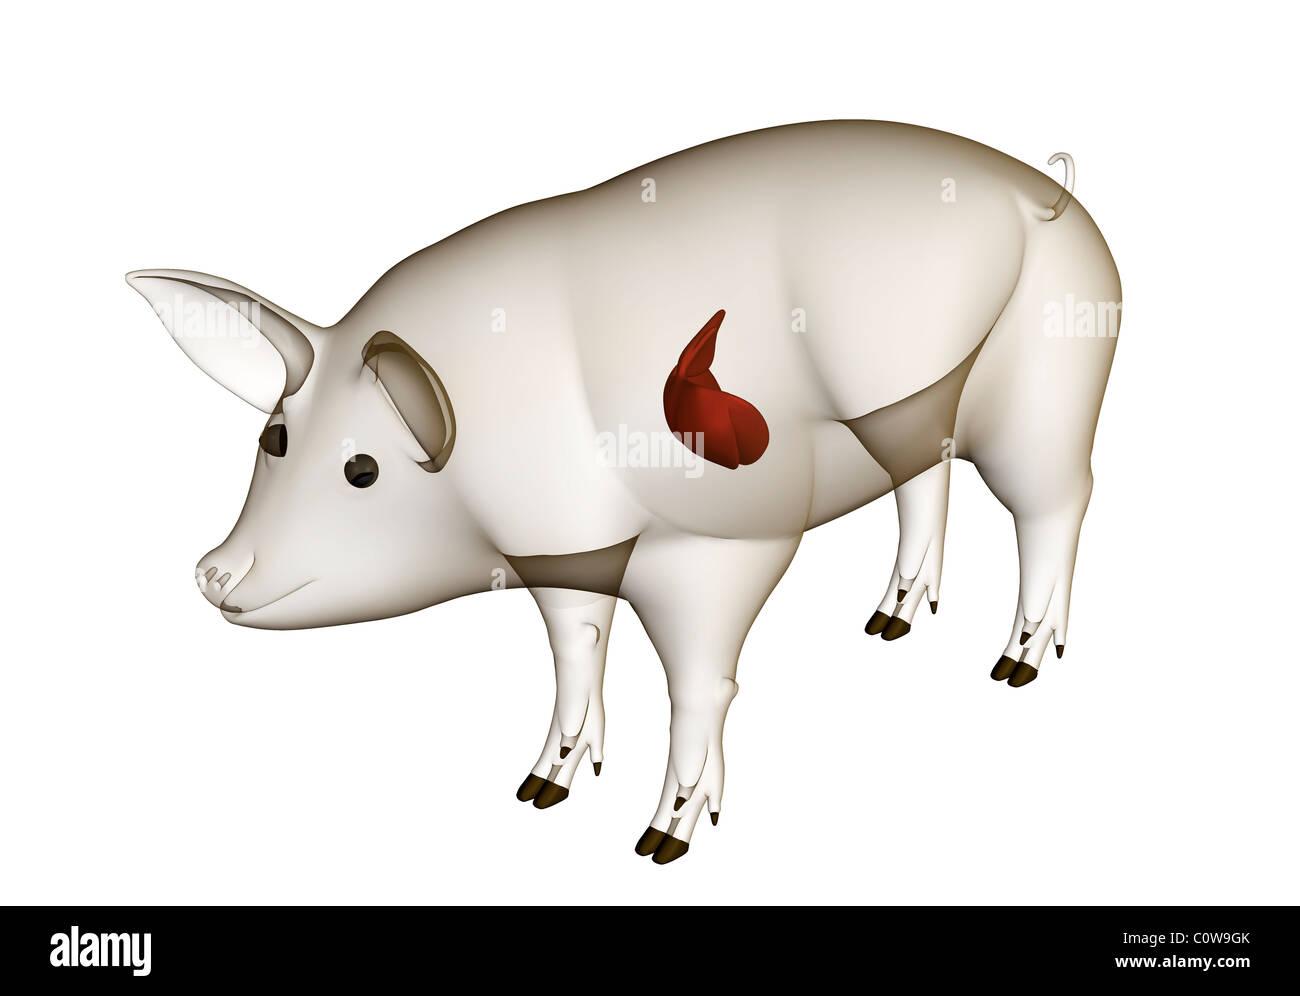 pig anatomy liver with transparent body Stock Photo: 34977059 - Alamy